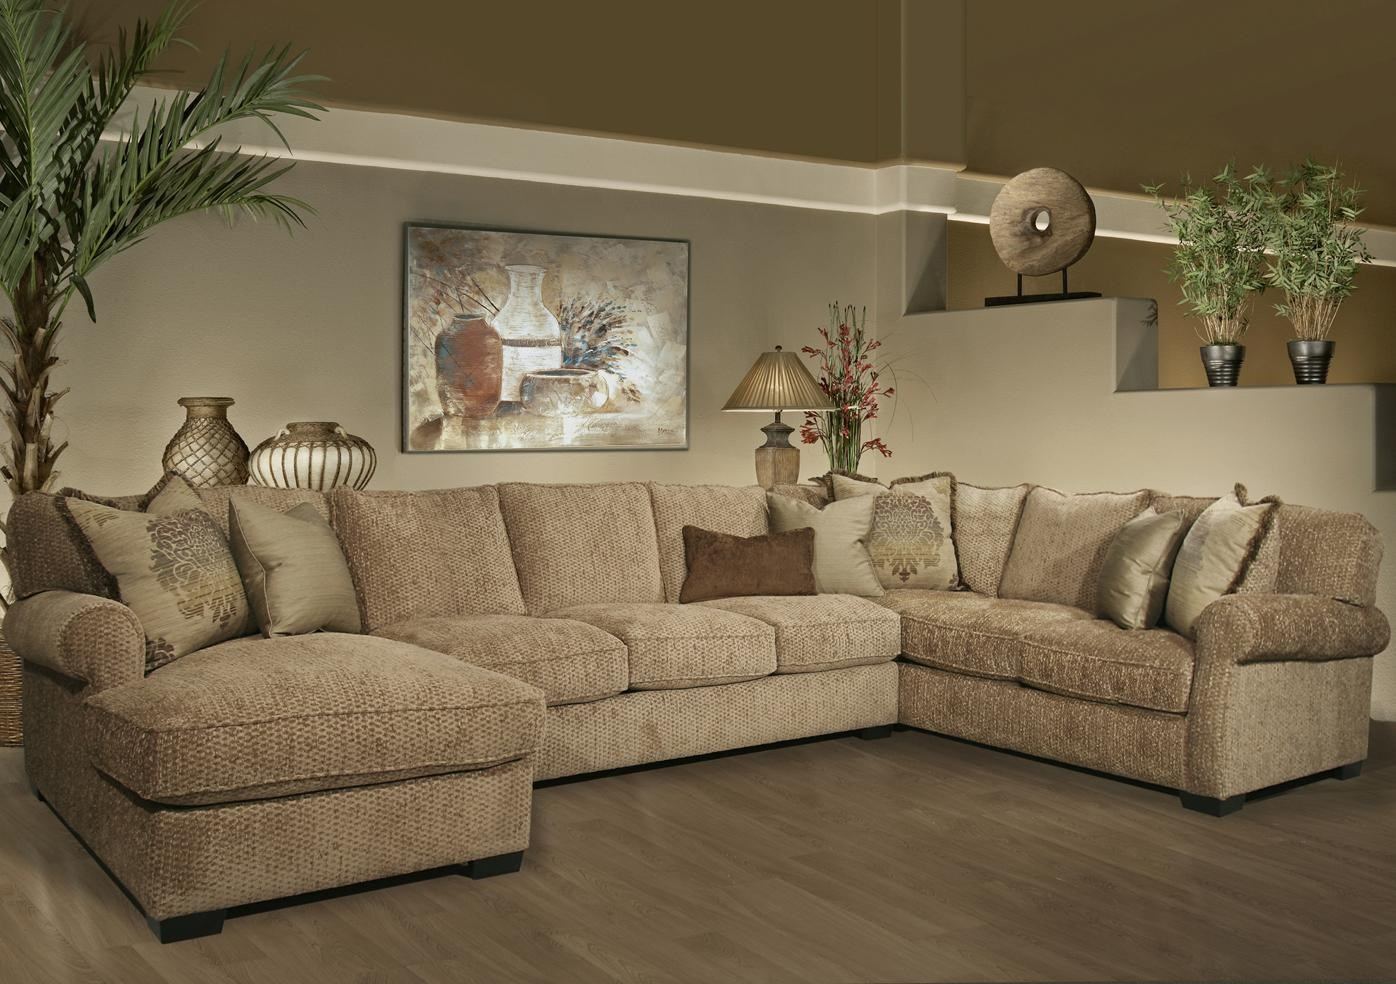 fairmont designs rio grande 3 piece sectional - 3 Piece Sectional Sofa